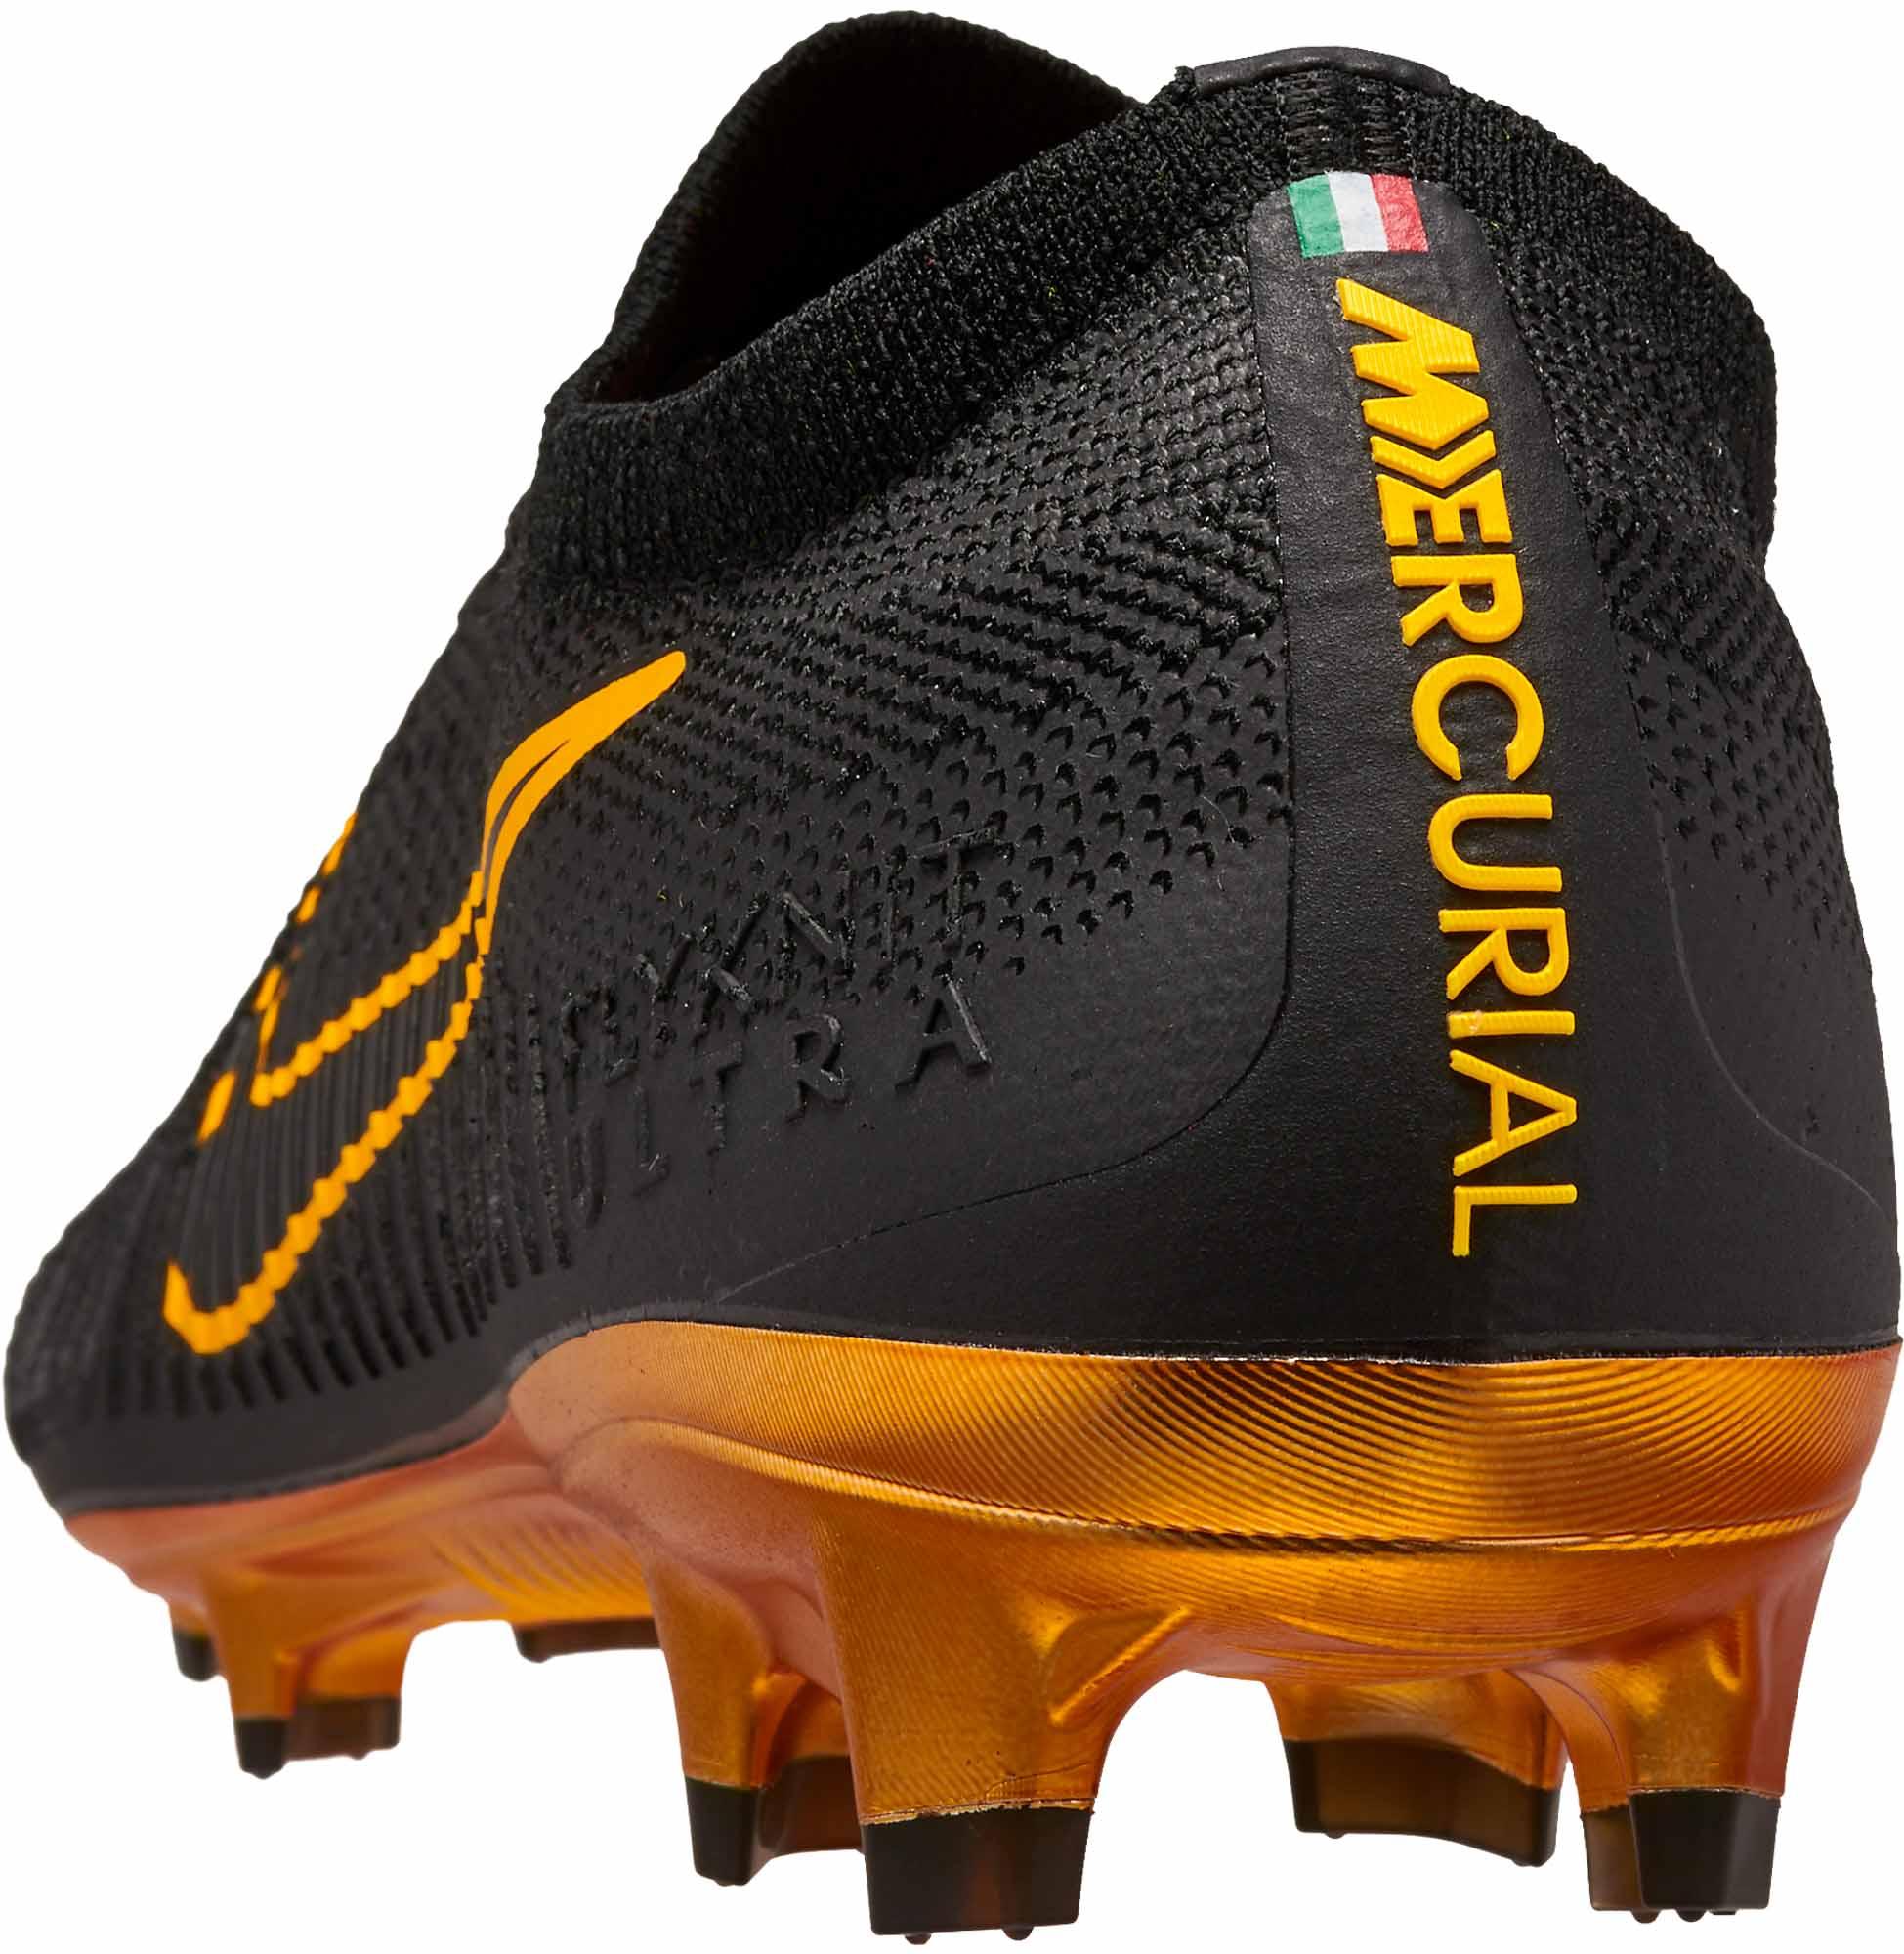 85b0060e2c5 Nike Flyknit Ultra FG - Black Nike Soccer Cleats